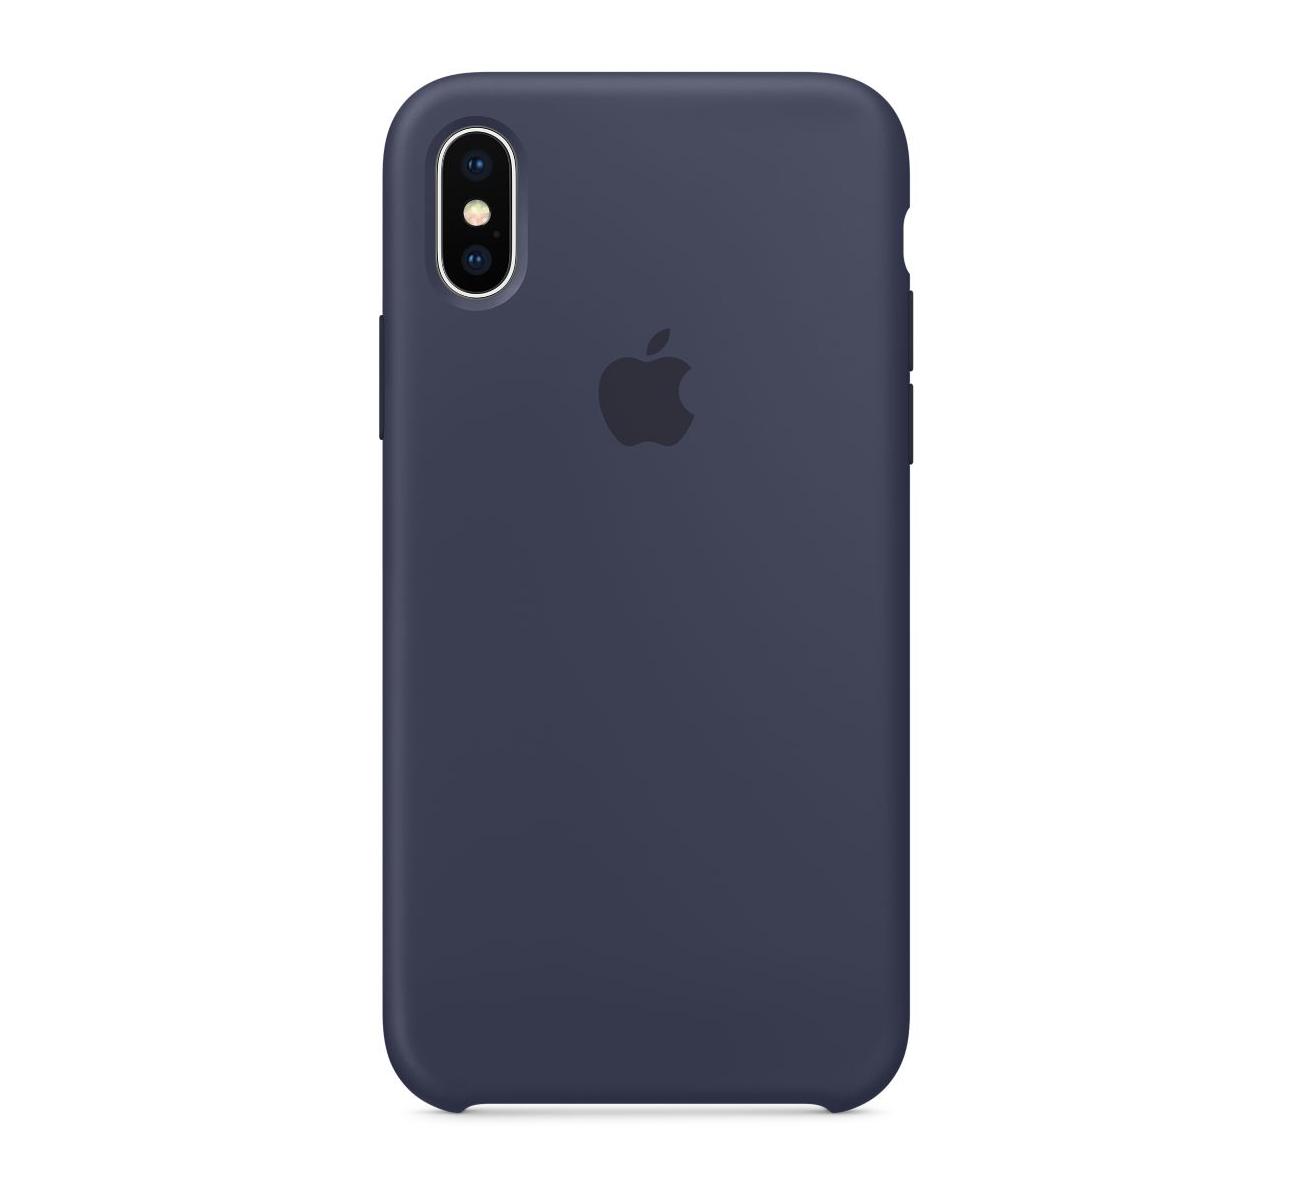 Apple silikónový obal pre iPhone XS – modrý 1